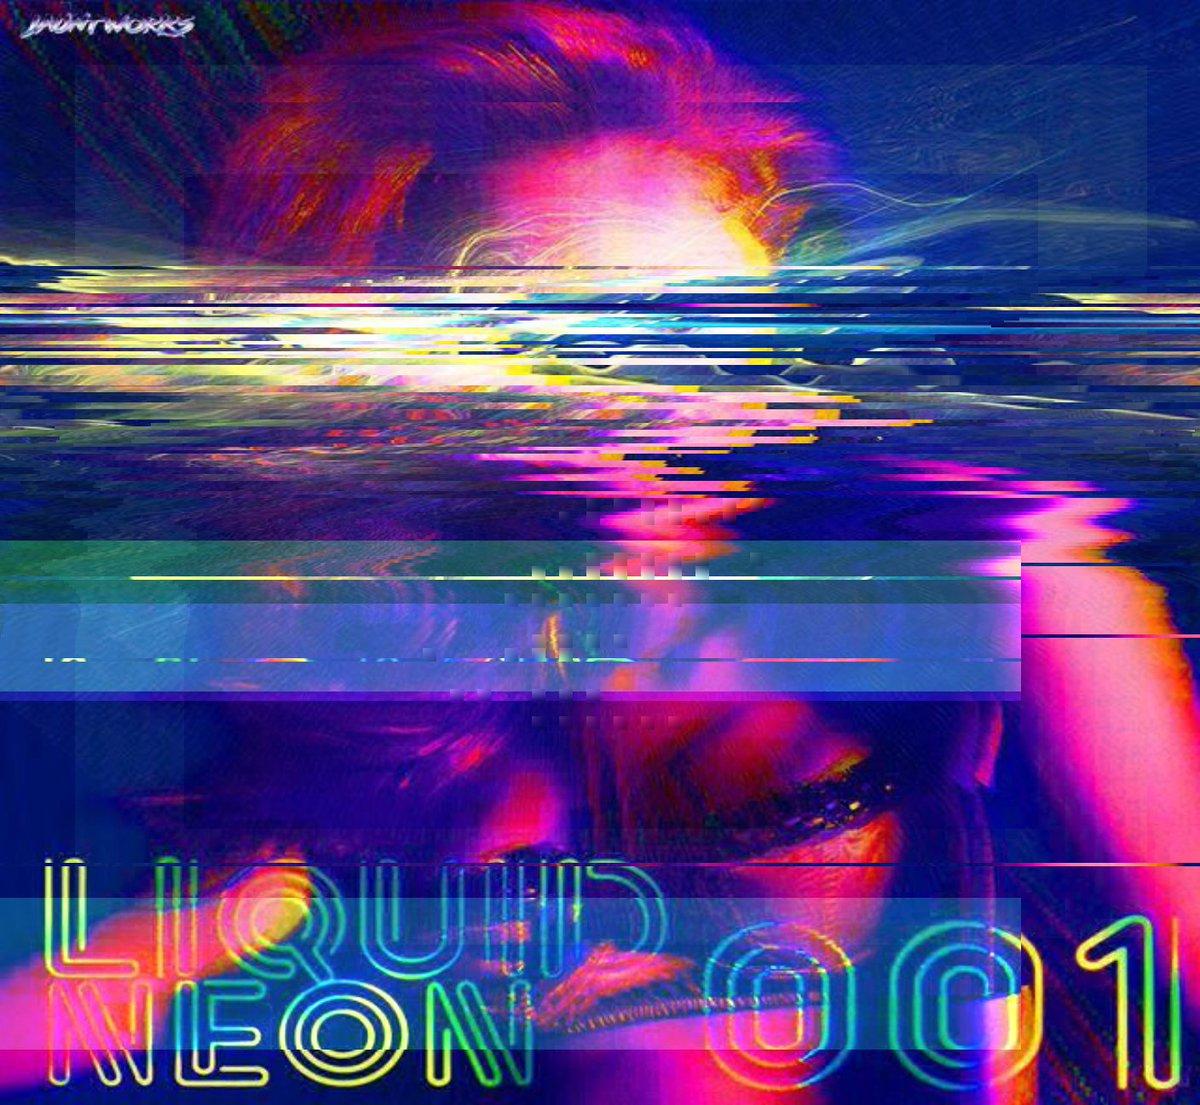 👾🎲 glitchart glitch synthwave vaporwave tumblraesthetic cyberc rad lofi Origin img by @jauntworks